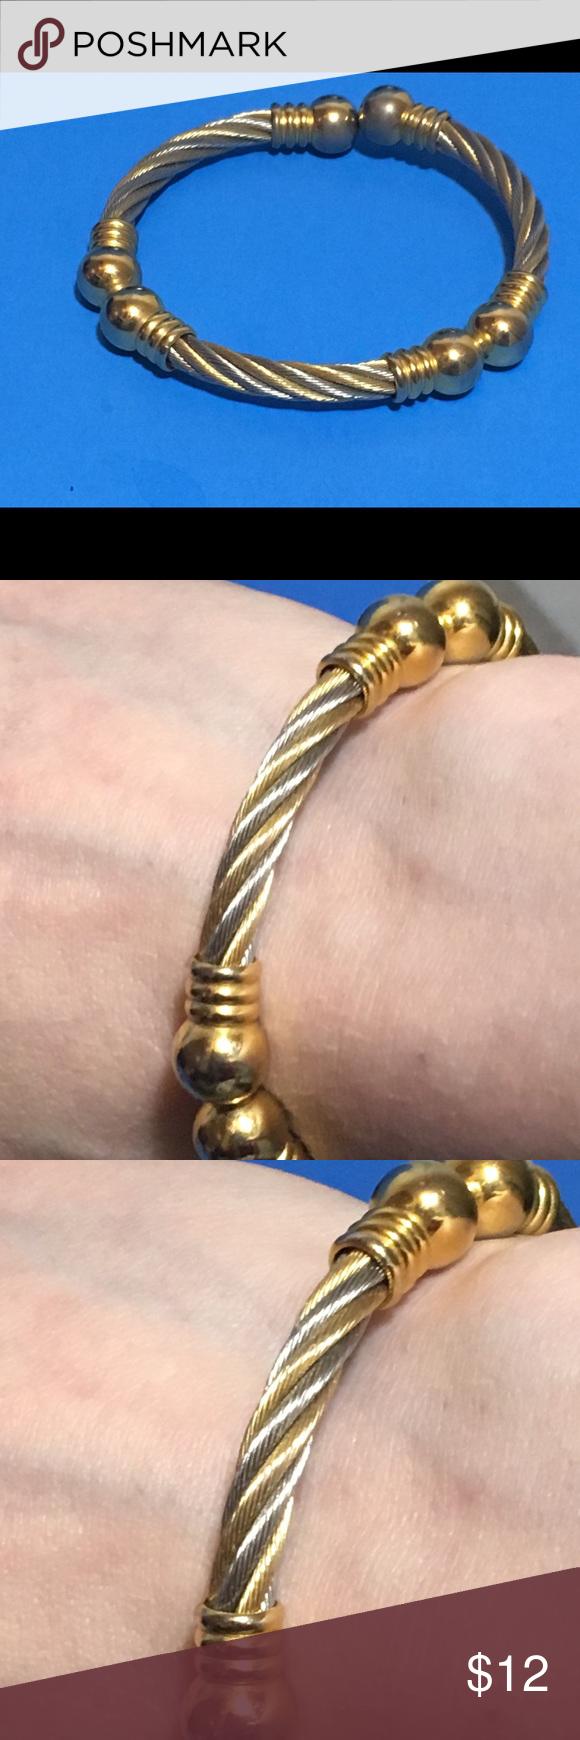 for silver and gold rope bracelet my posh picks pinterest